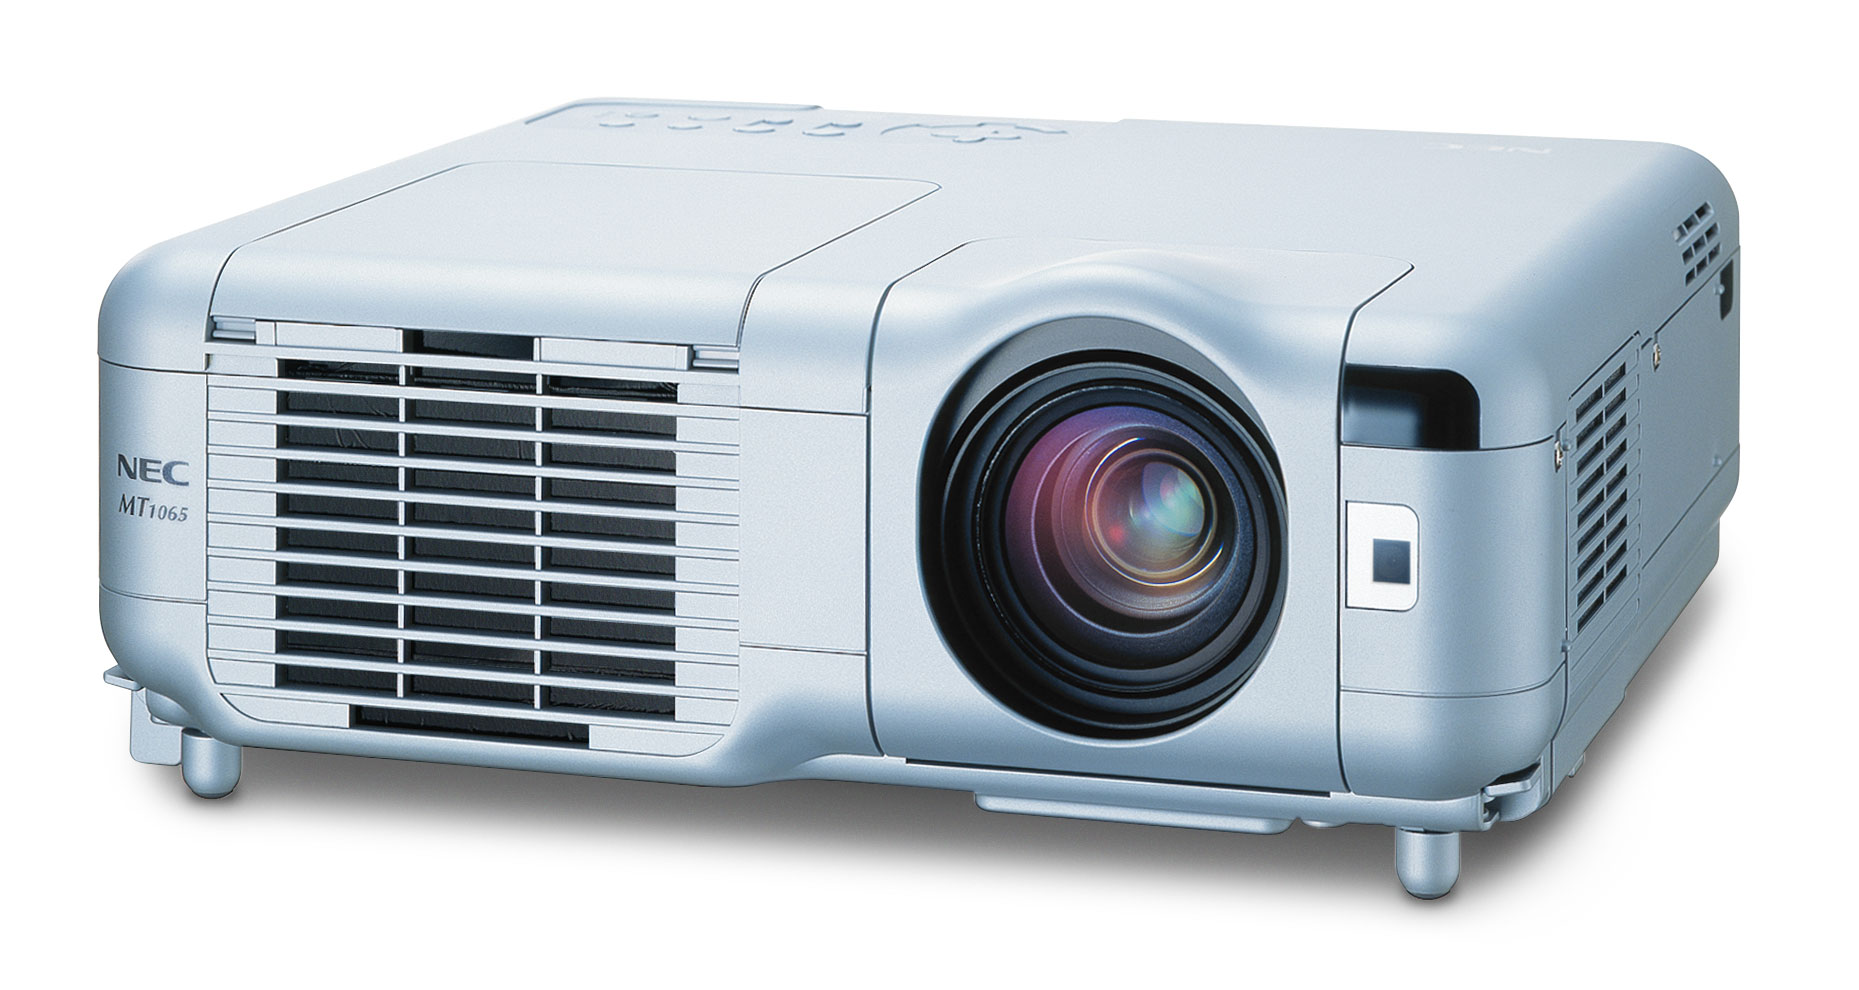 Nec Projektoren: Nec MT1065 XGA LCD Beamer